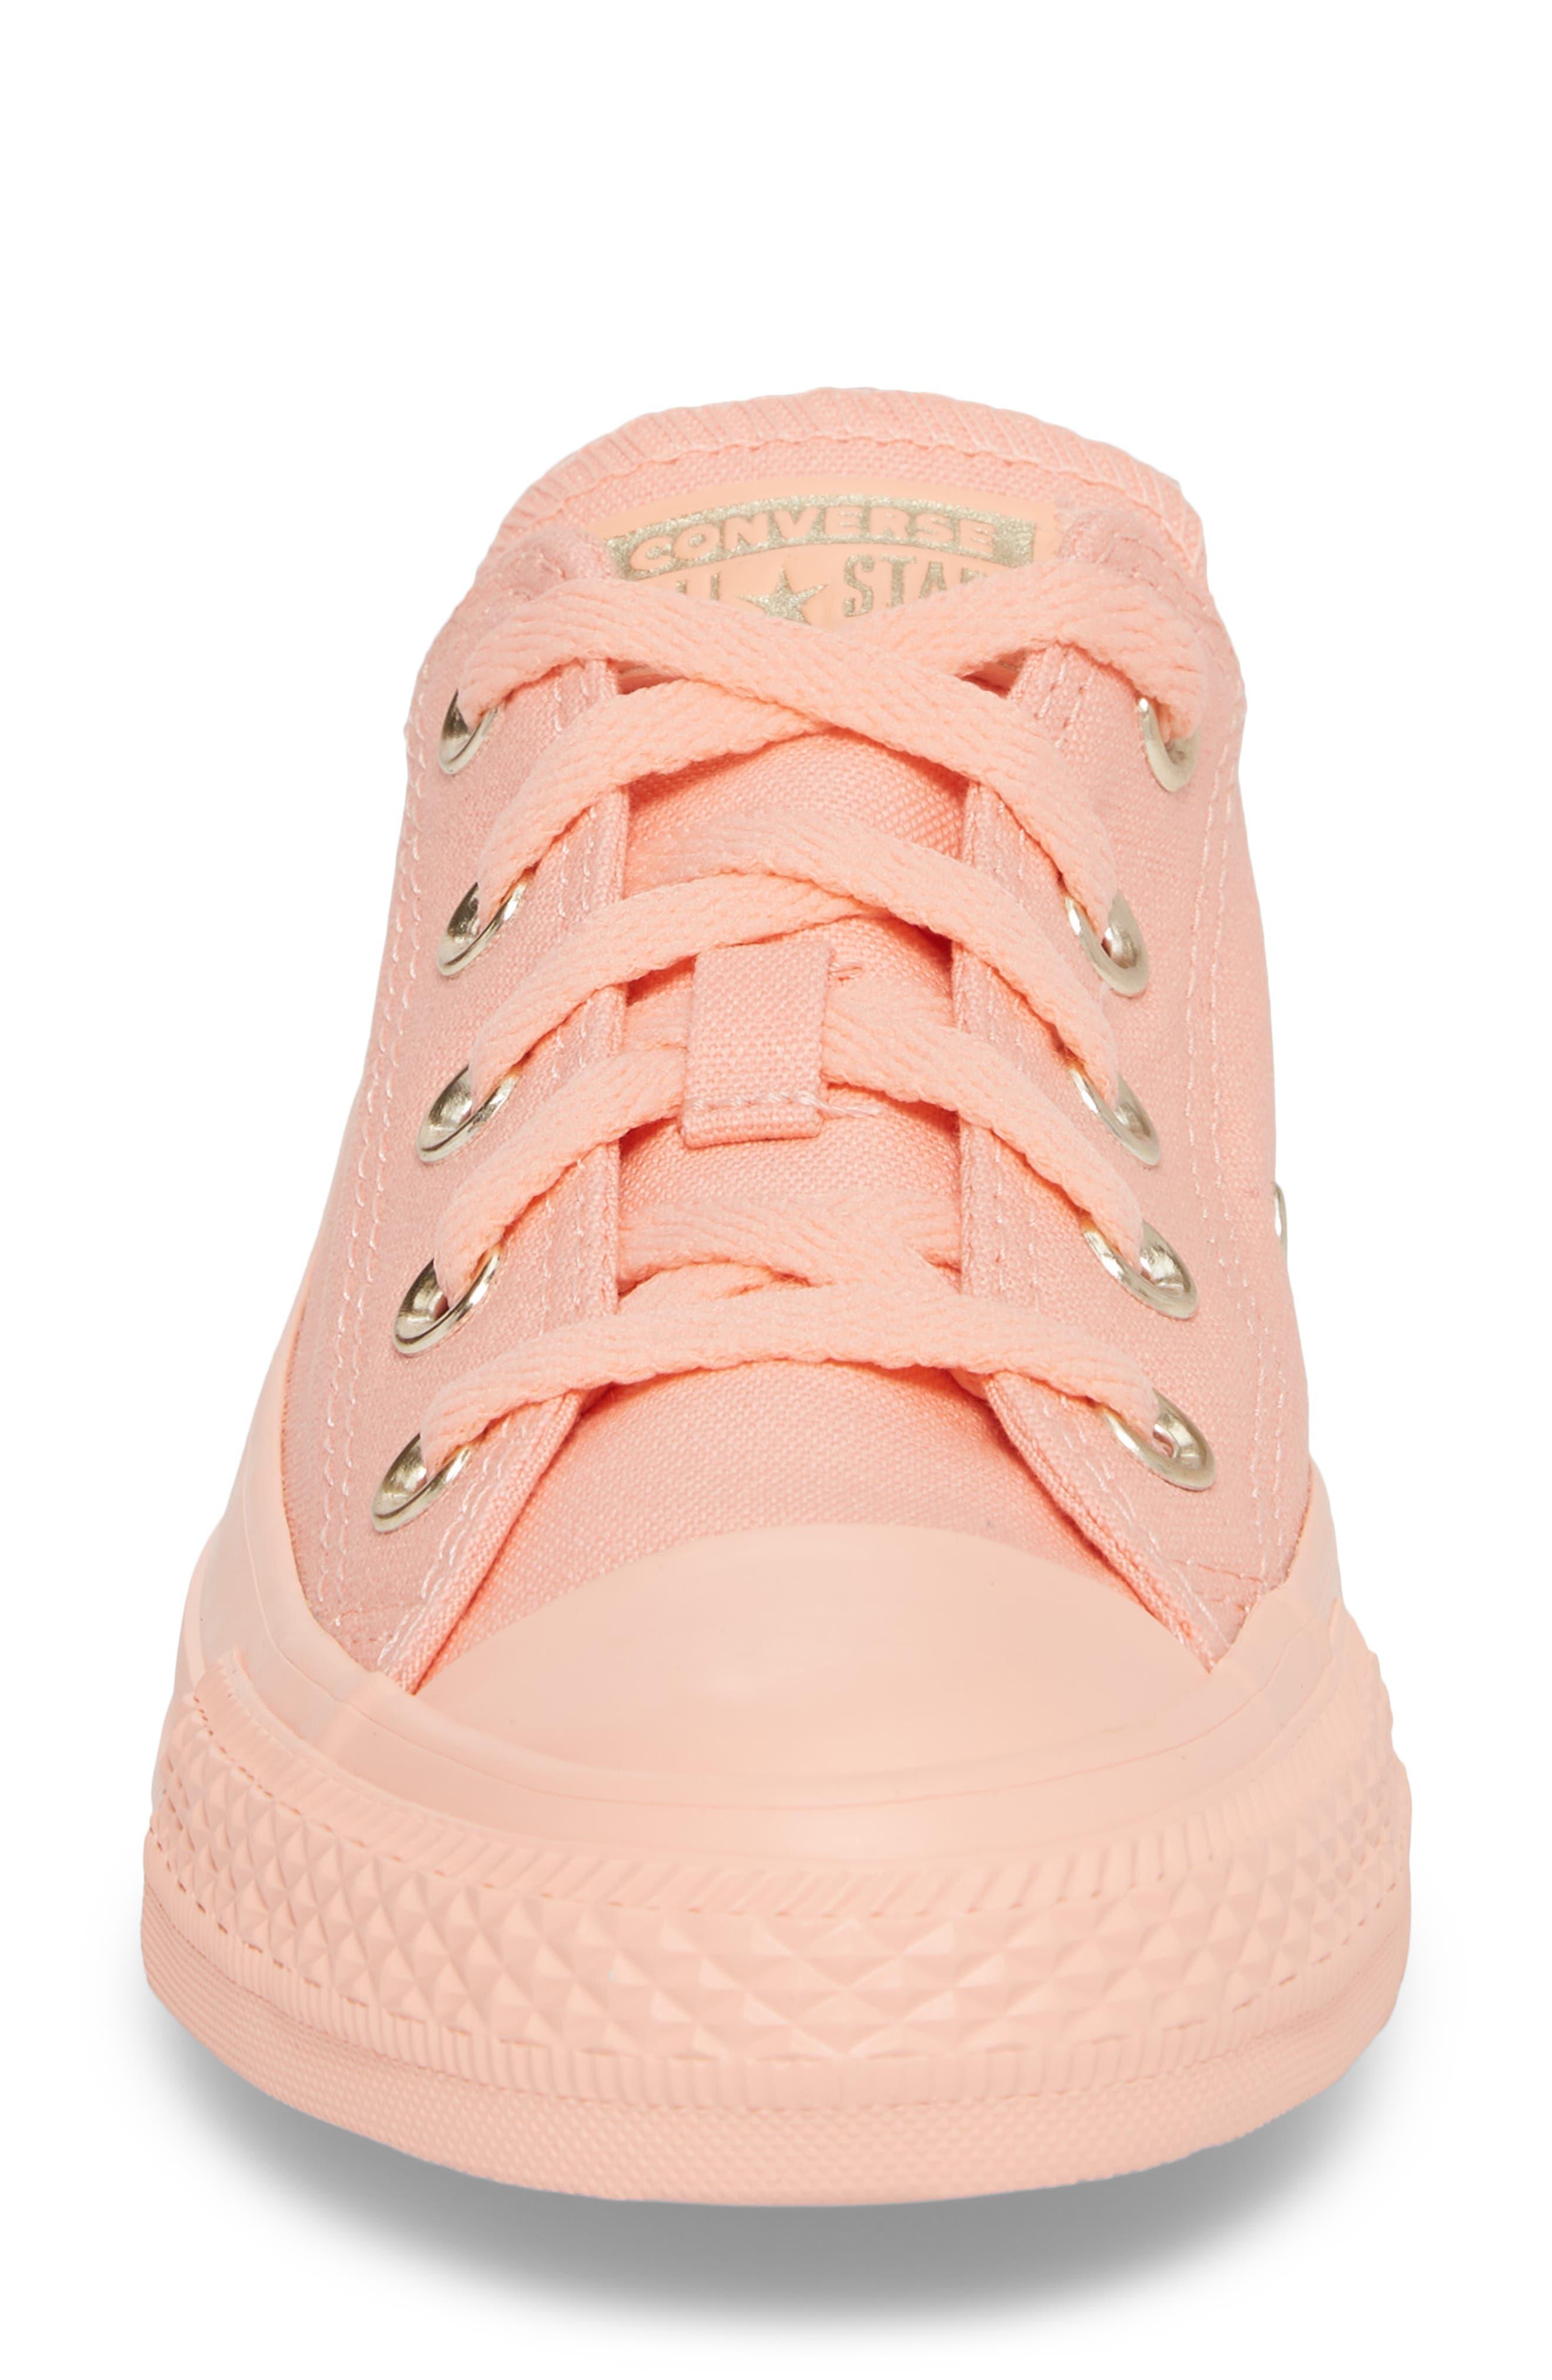 Chuck Taylor<sup>®</sup> All Star<sup>®</sup> Seasonal Color Sneaker,                             Alternate thumbnail 4, color,